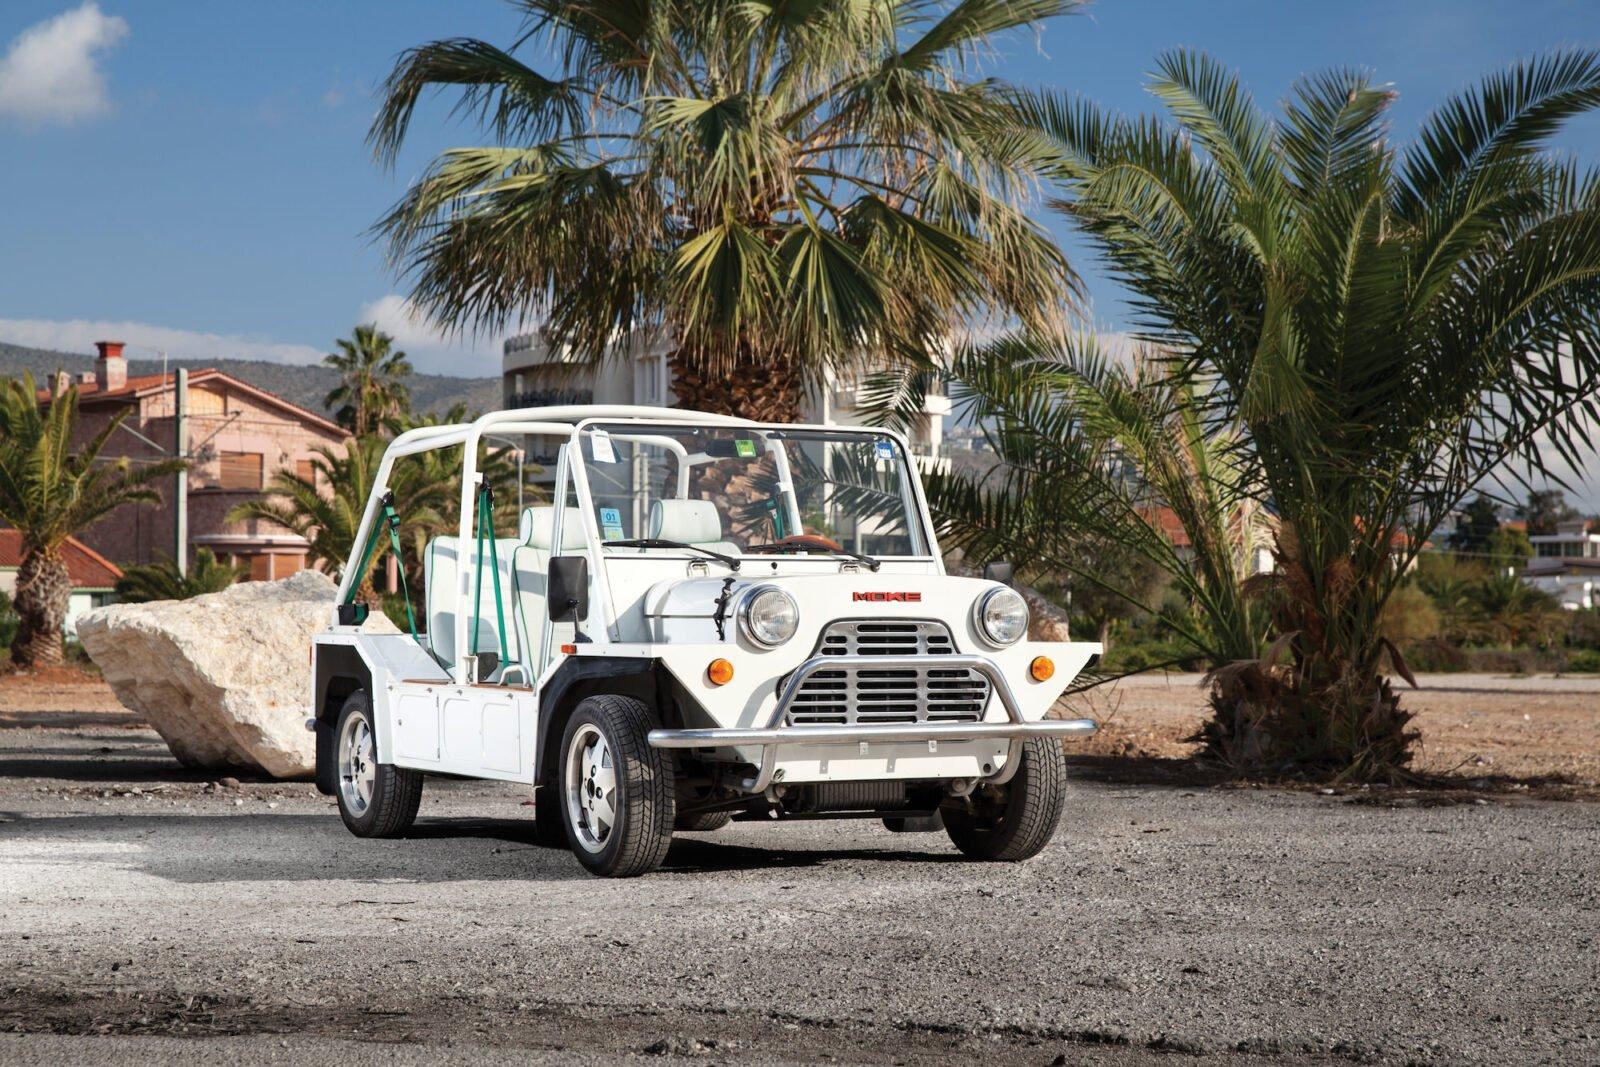 Mini Moke 1600x1067 - Cagiva Moke